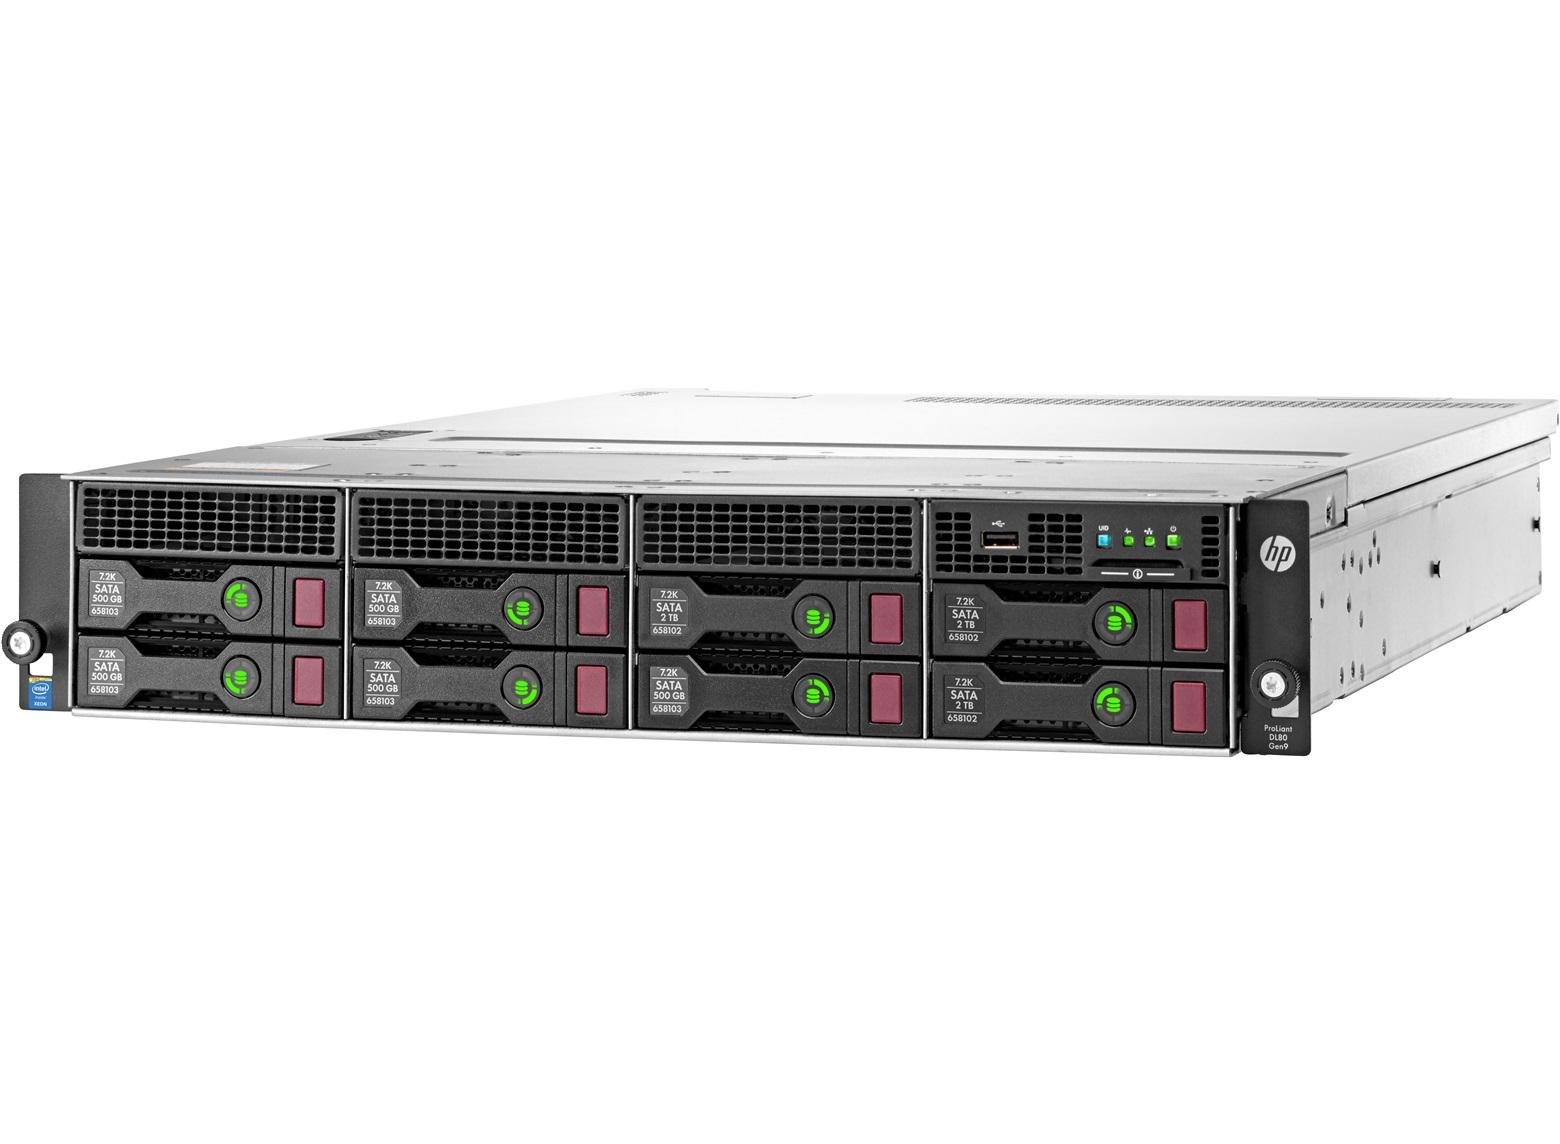 HP DL80 Gen9 E5-2603v3, 4GB, 4 LFF, B140